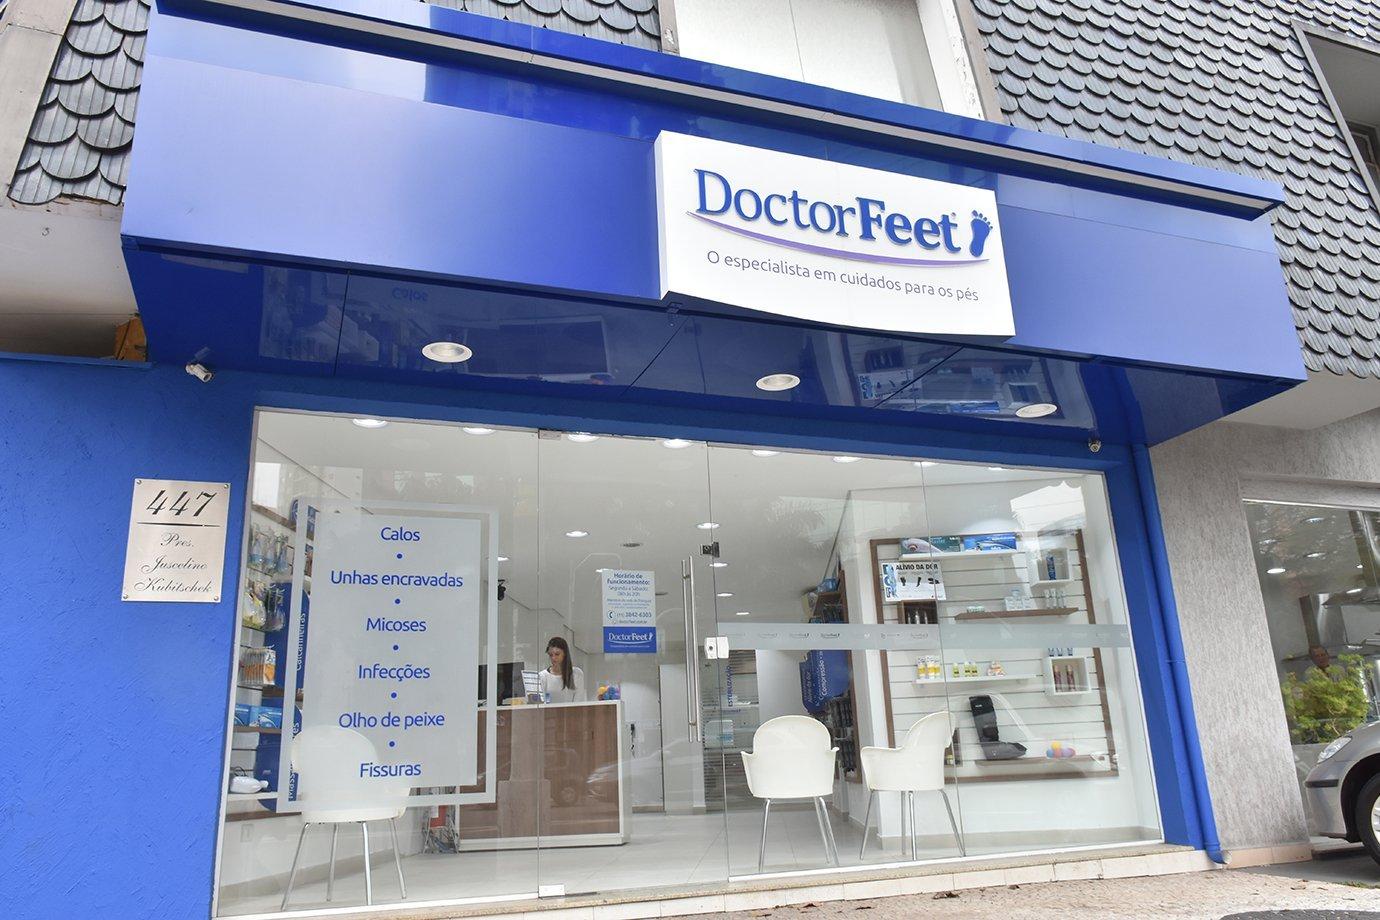 Doctor Feet